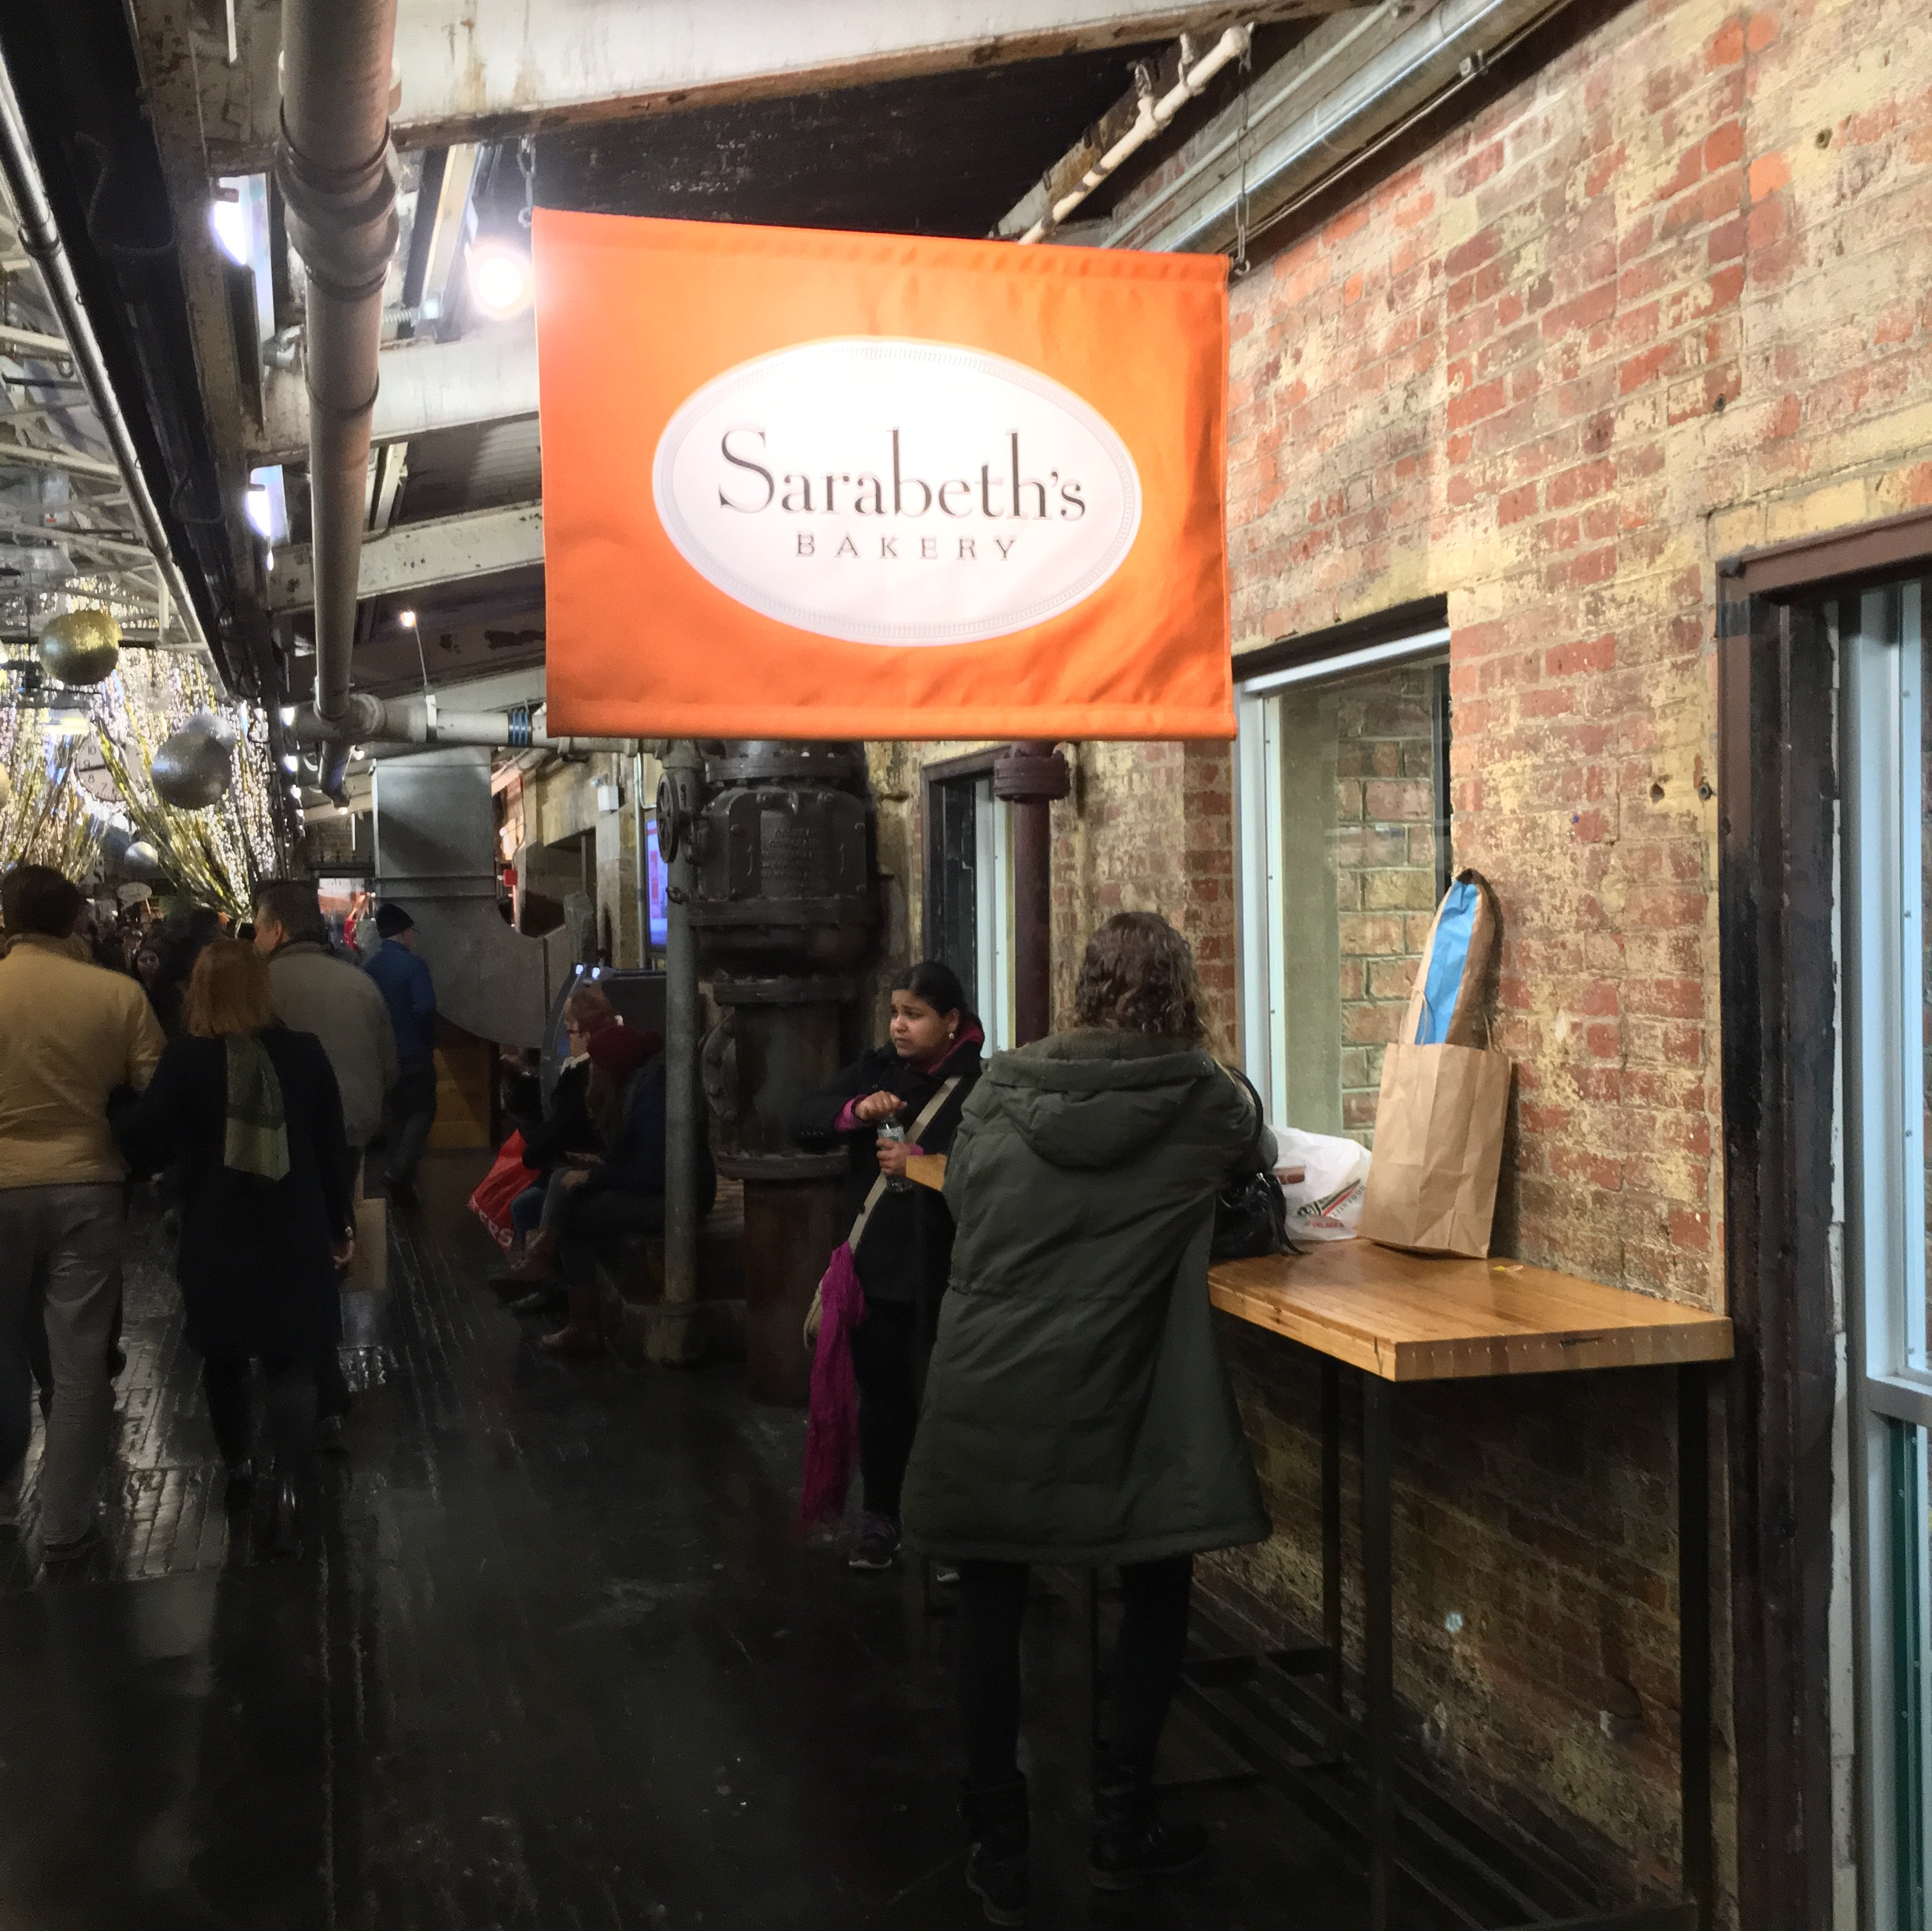 Sarabeths Bakery Chelsea Market